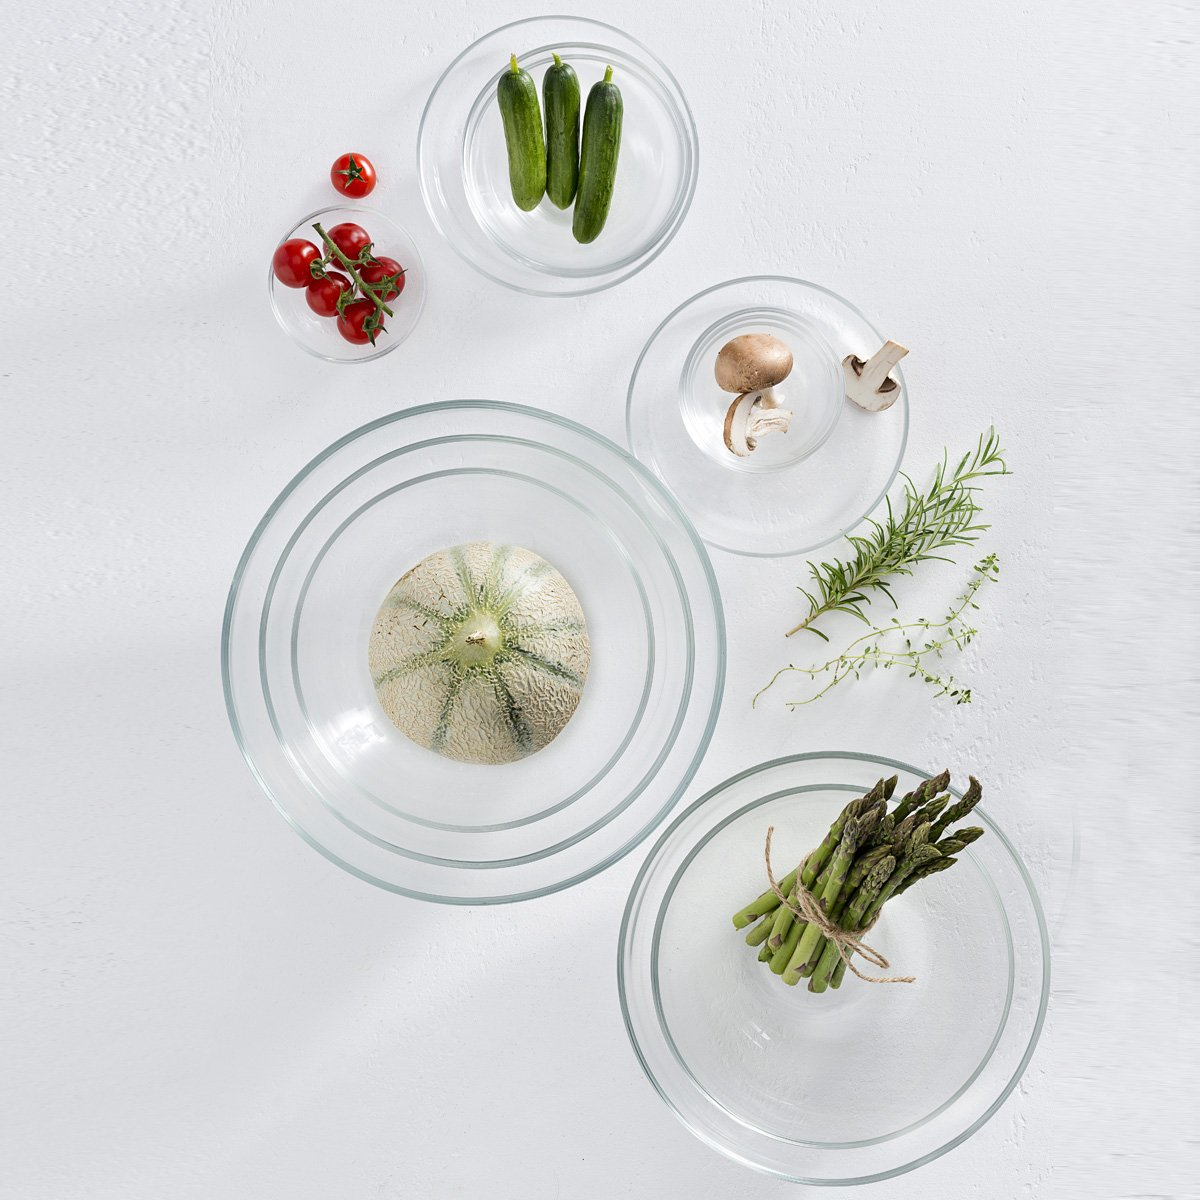 LEONARDO Cucina Insalatiera Rotondo Vetro Trasparente 1pezzo i